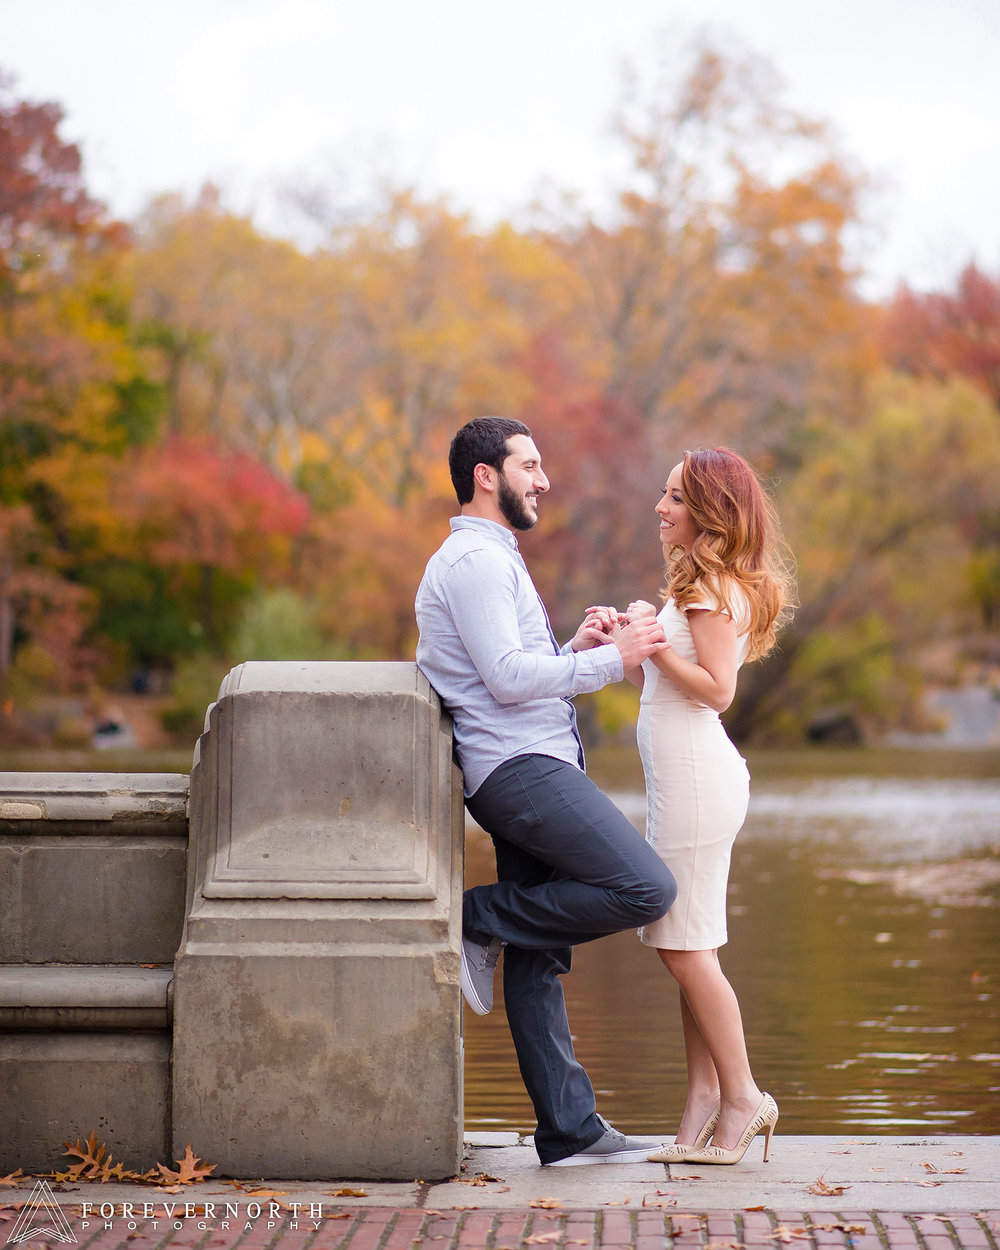 Giangrande-Central-Park-New-York-Engagement-Photos-05.JPG